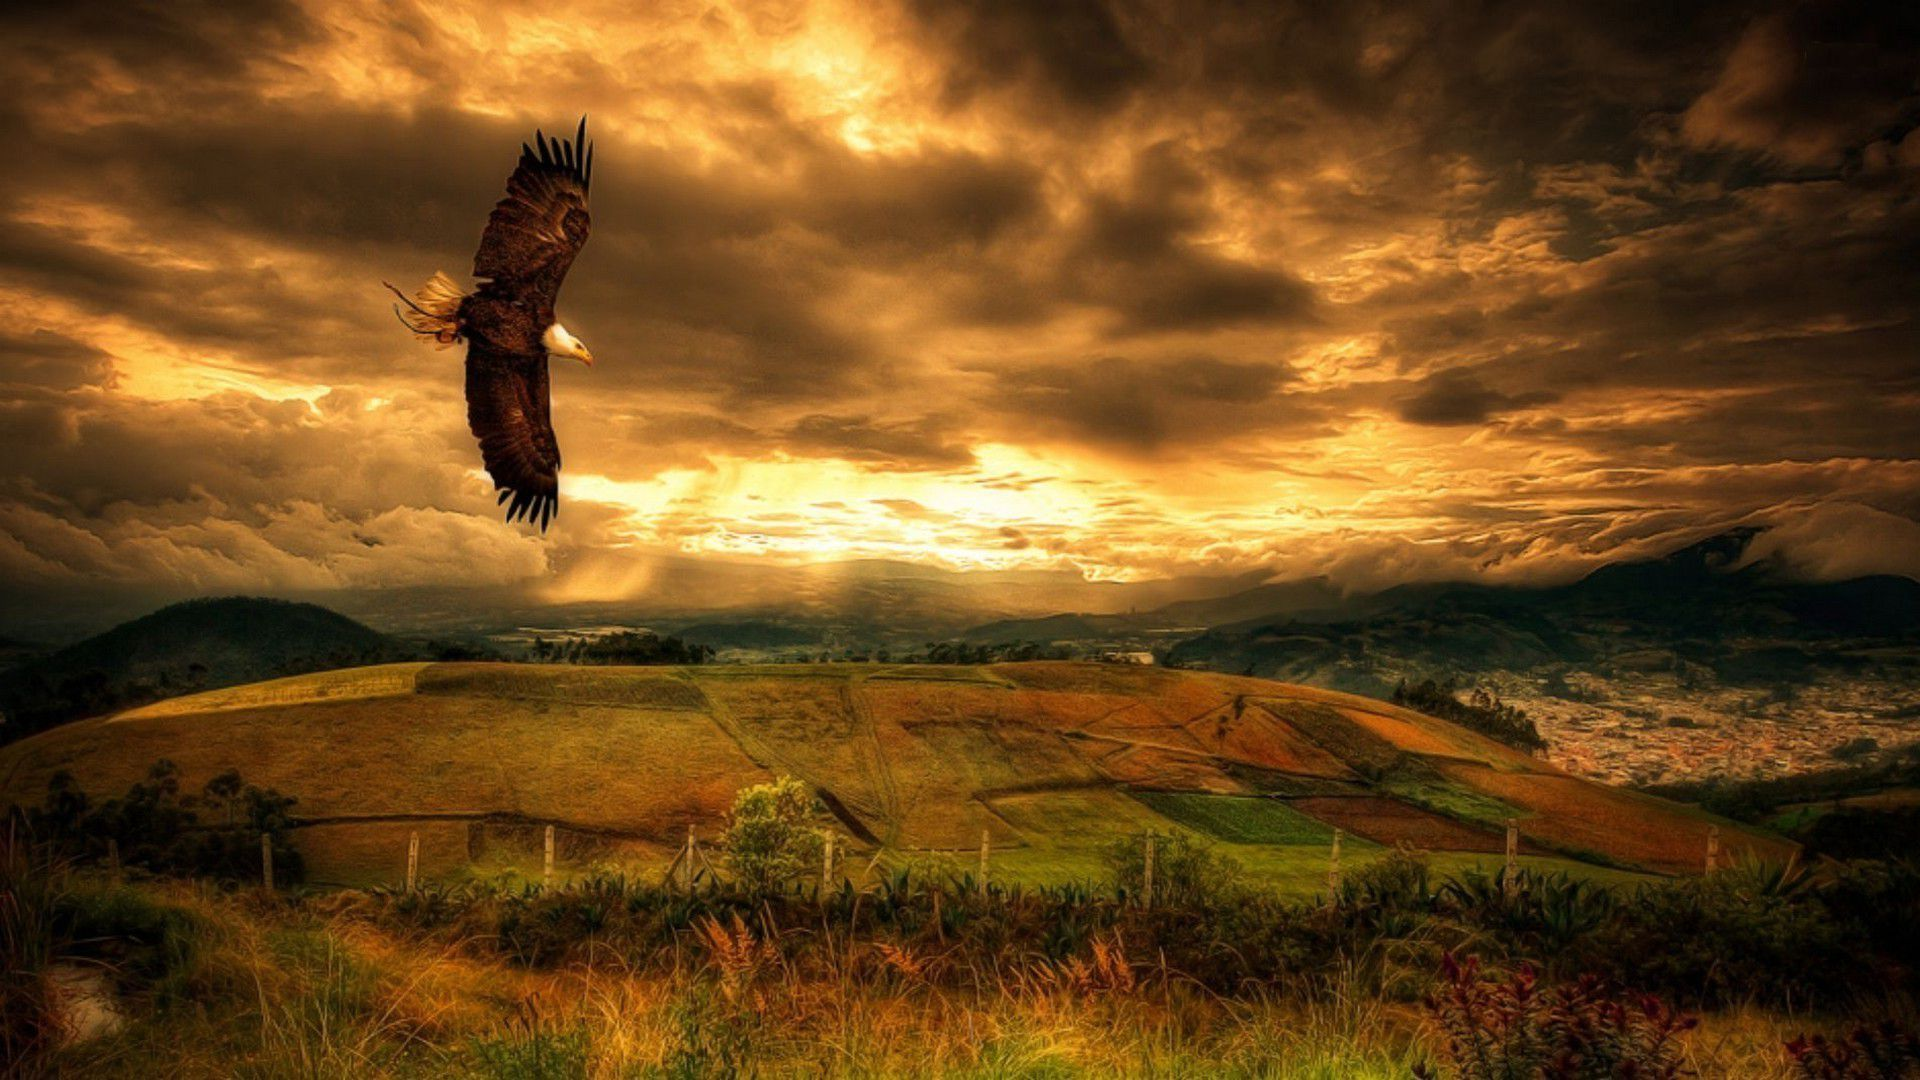 Hd wallpaper eagle - Free Bald Eagle Wallpapers Wallpaper Hd Wallpapers Pinterest Eagle Wallpaper And Wallpaper